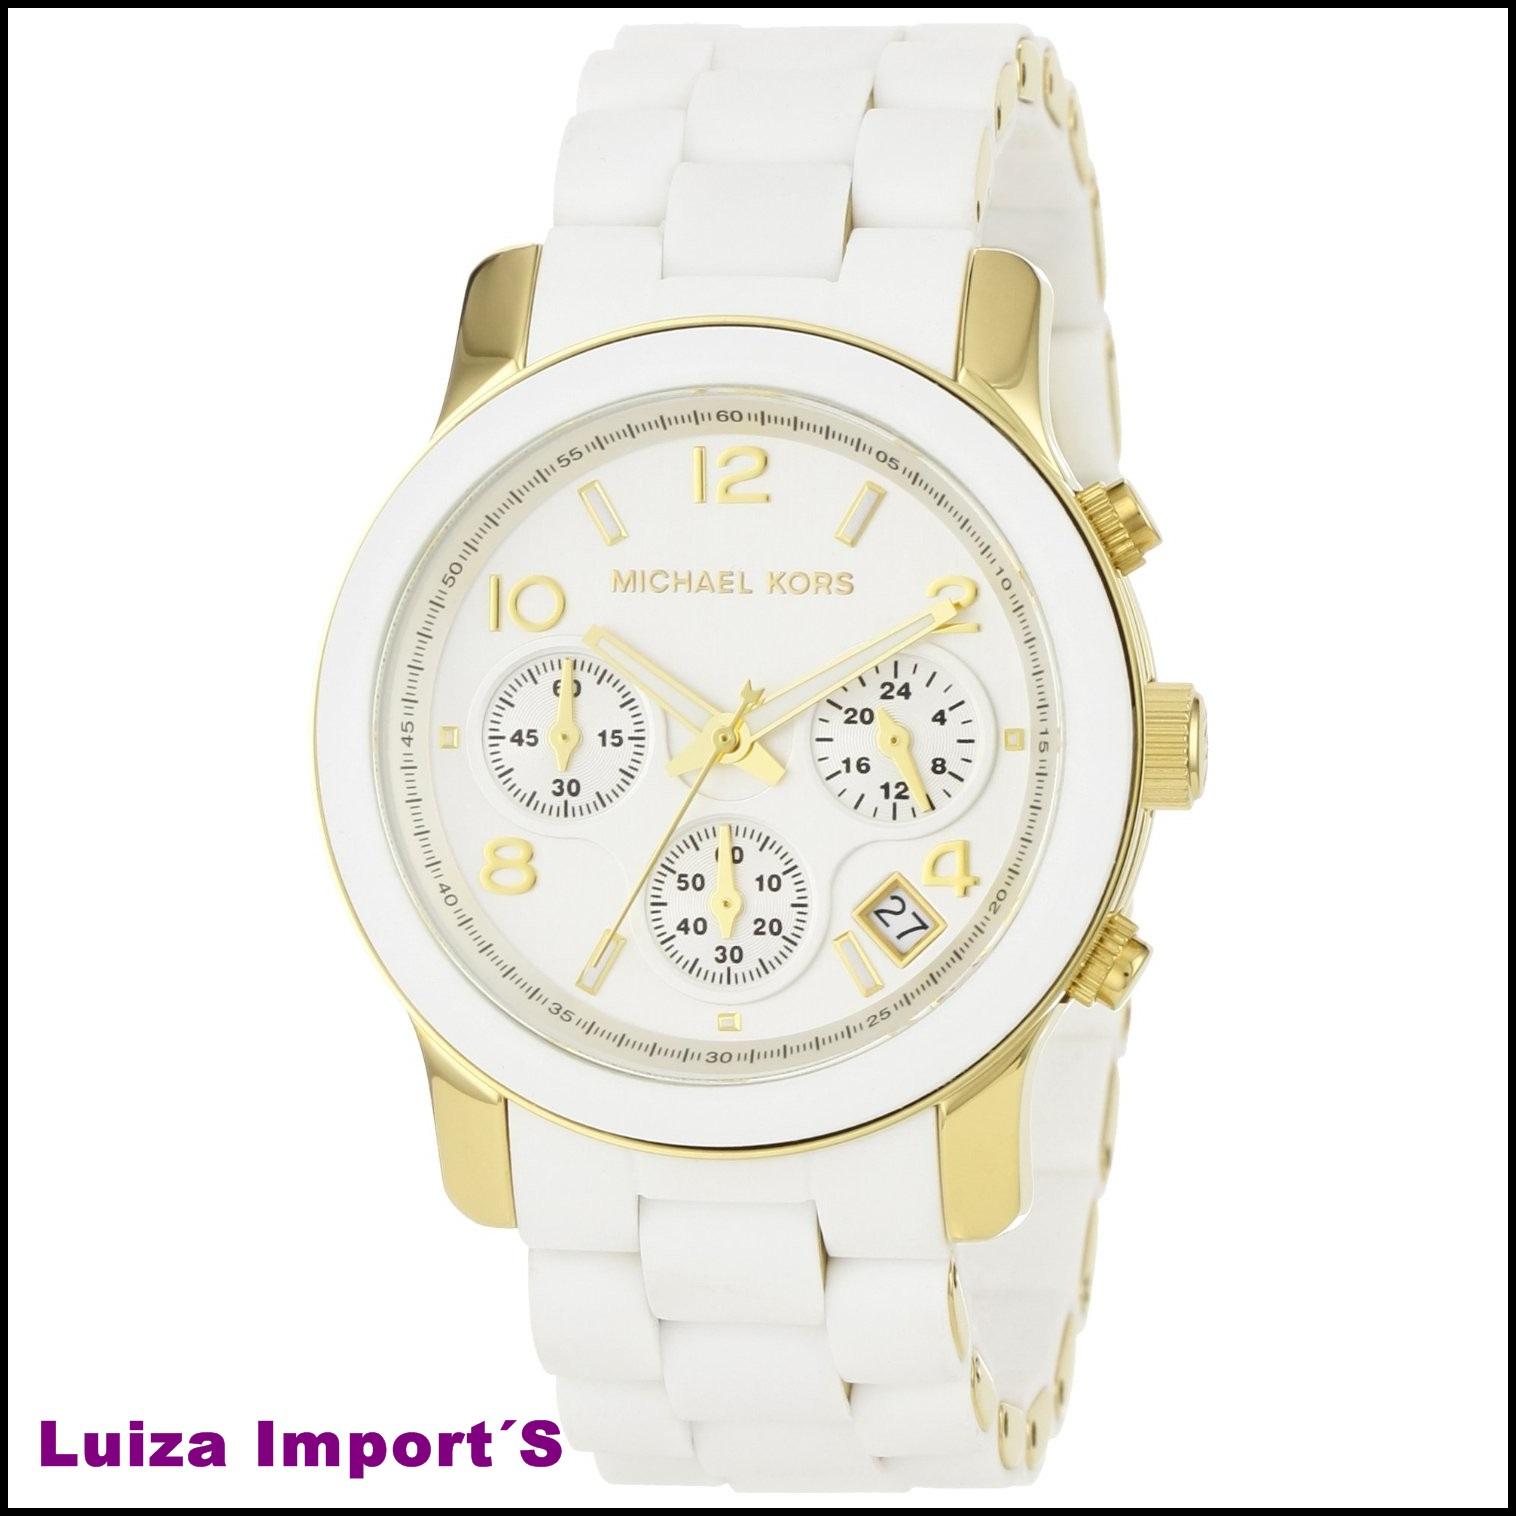 72006135783 LuizaImportS  Relógio Michael Kors - Replica